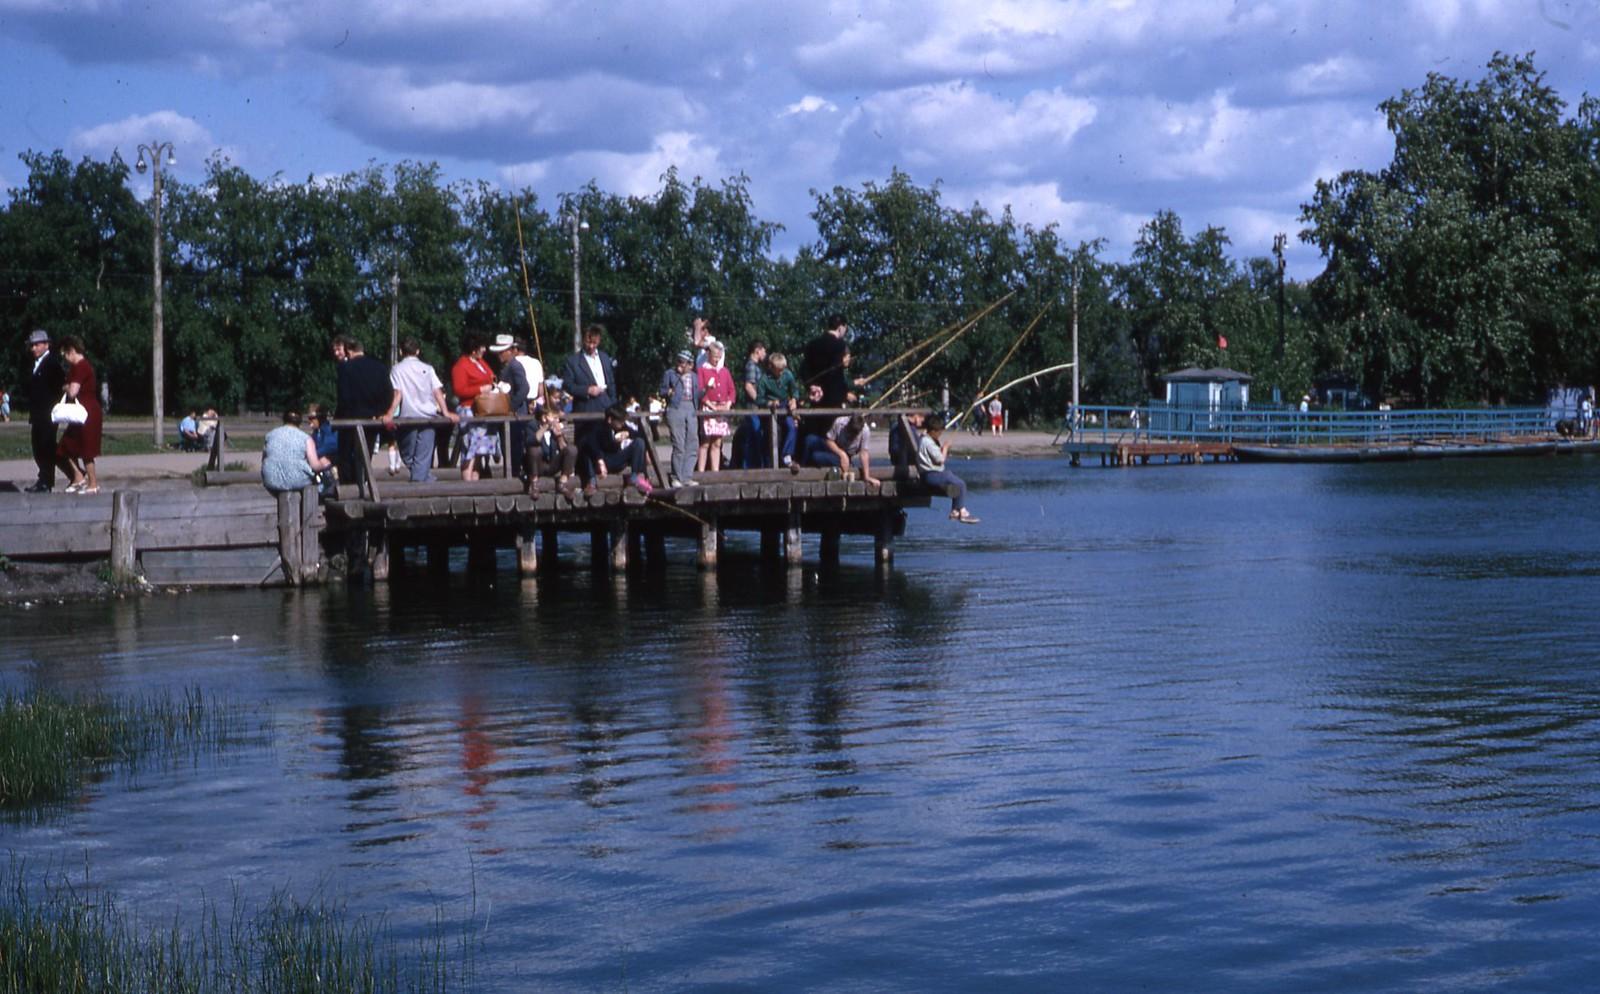 hammond-MA10-Ostankino-people-sunbathing-and-fishing-025